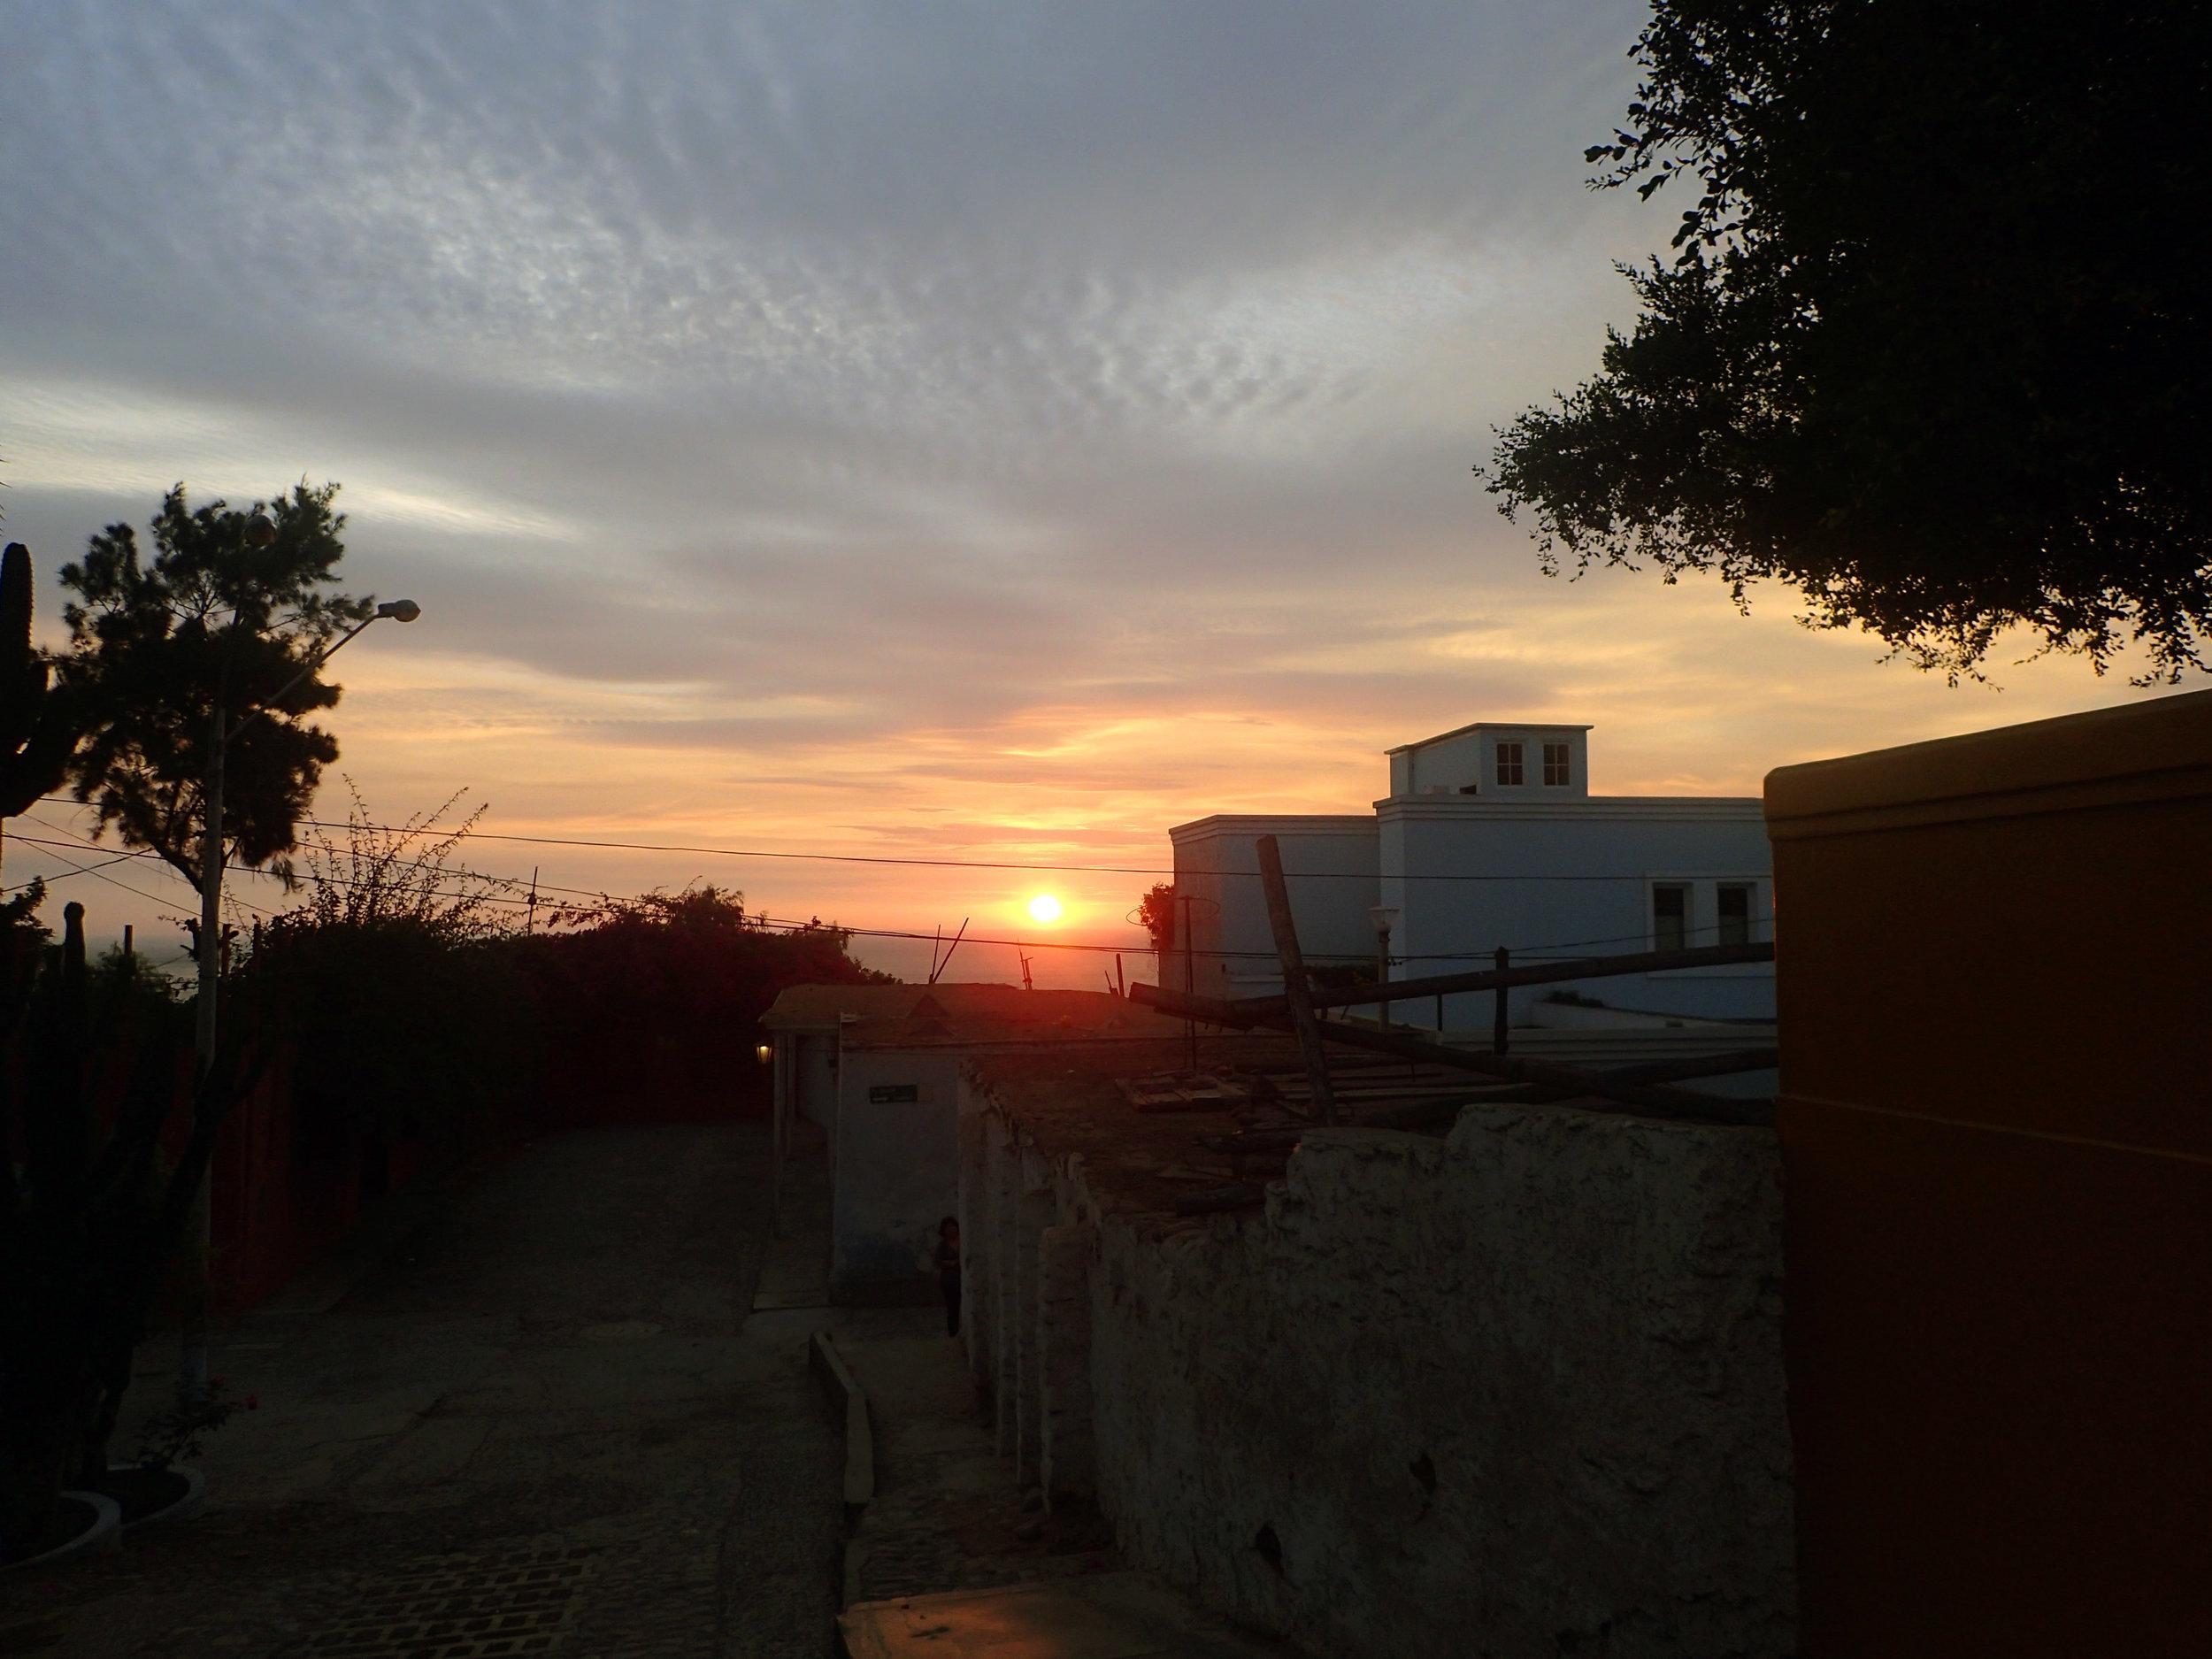 1-6-18 sunset from Barranco.jpg